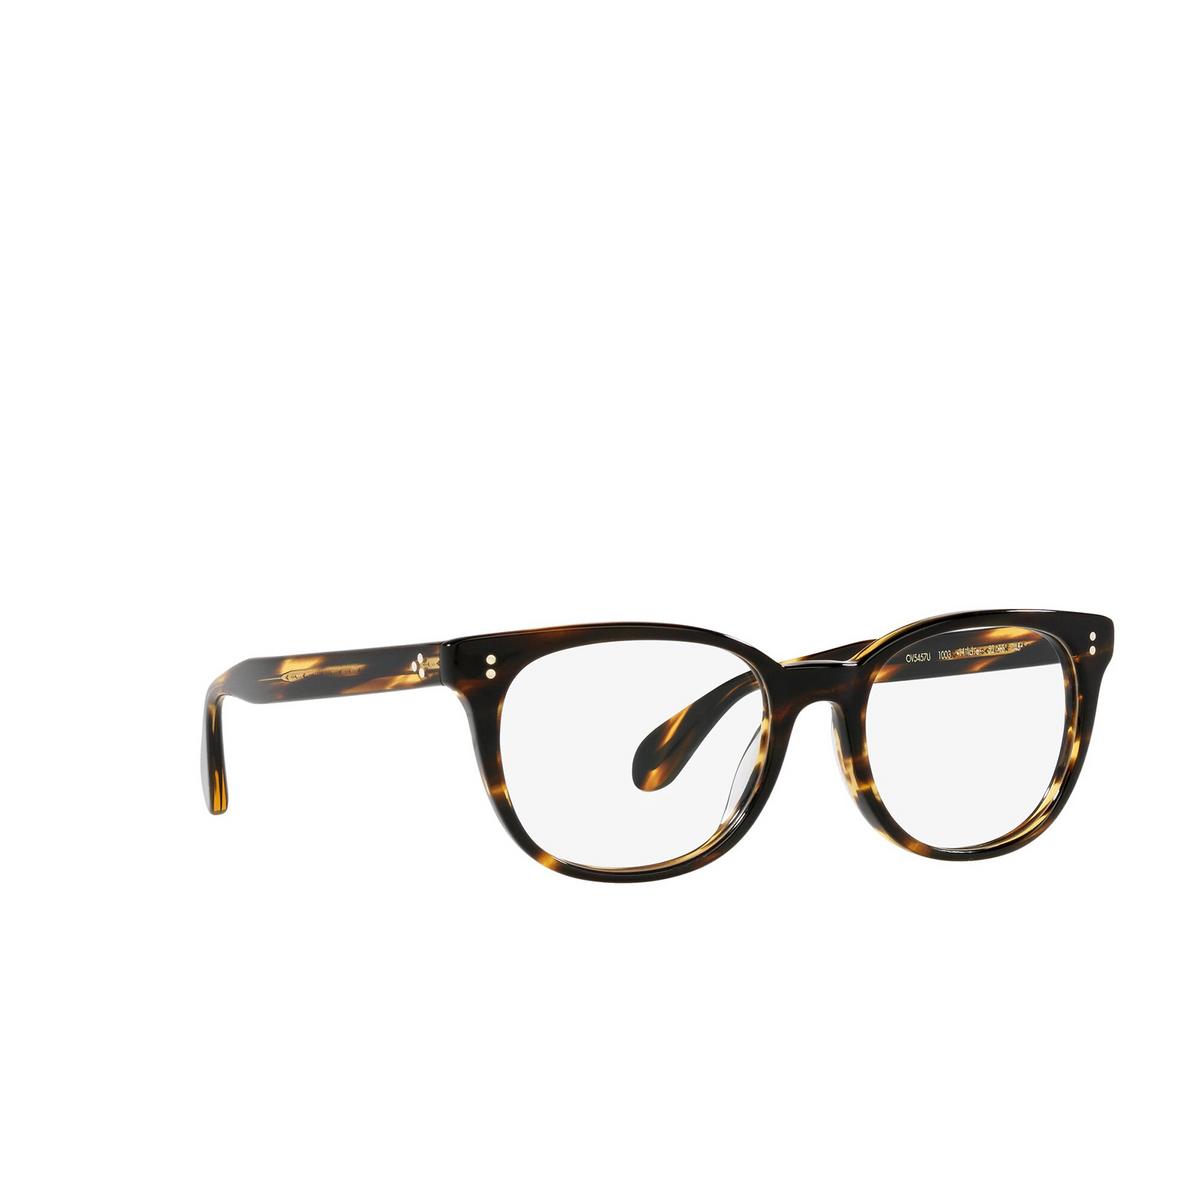 Oliver Peoples® Cat-eye Eyeglasses: Hildie OV5457U color Cocobolo 1003 - three-quarters view.